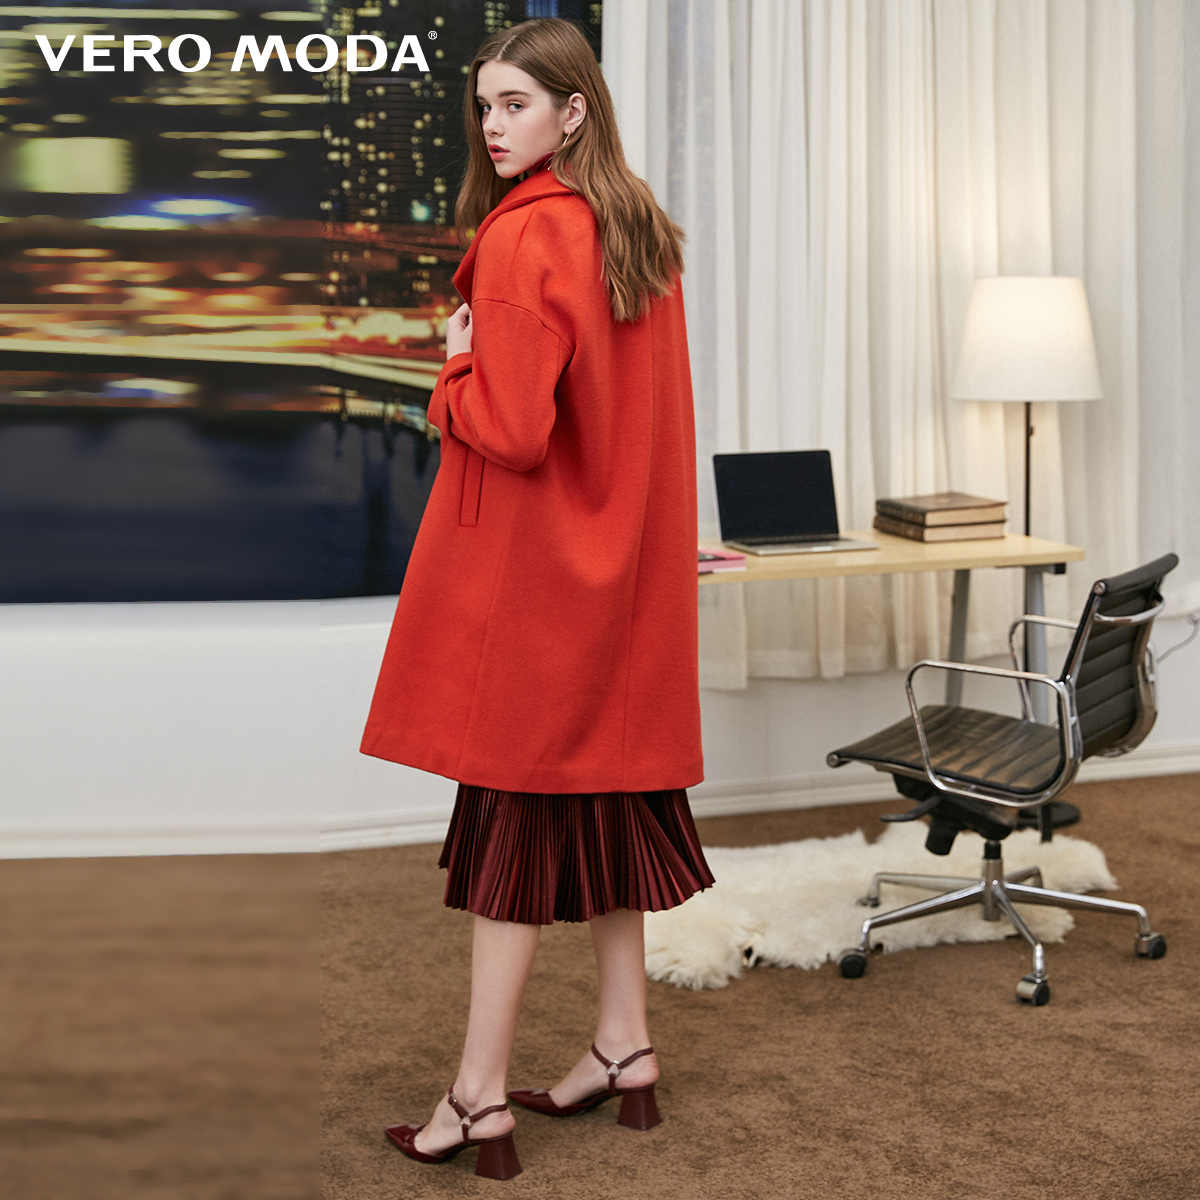 Vero Moda Winter Vrouwen Loose Fit Single-breasted Wollen Jas Overjas Jas | 318327529